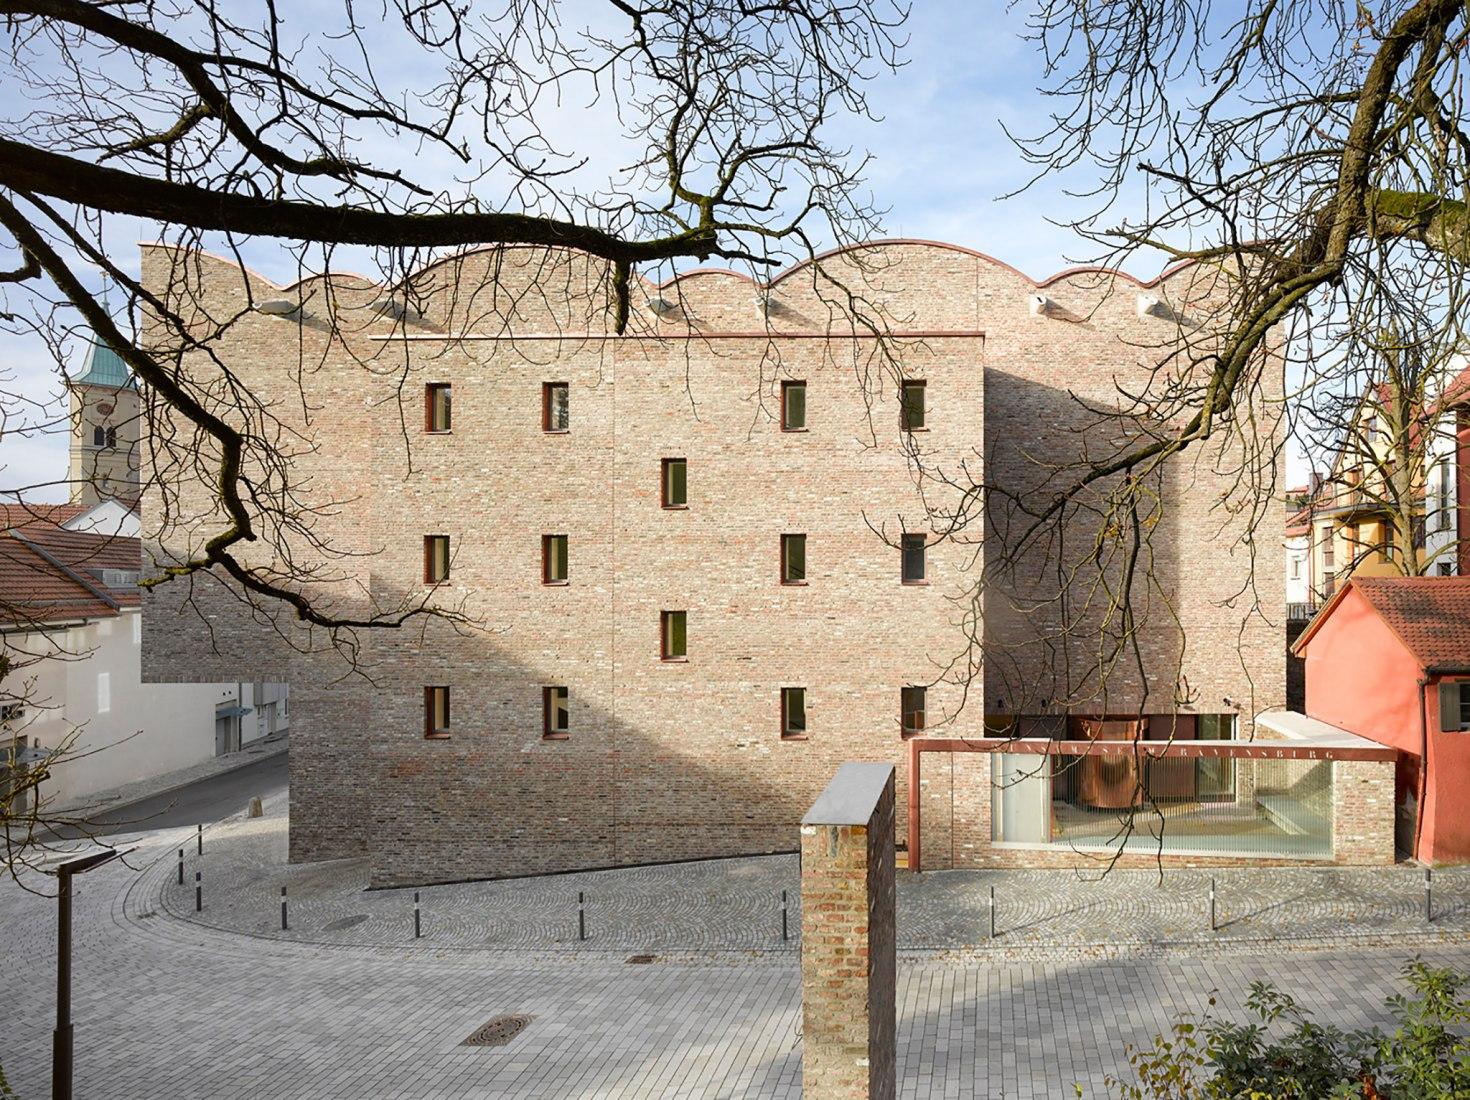 Vista exterior. Museo de Arte en Ravenbsurg por Lederer, Ragnarsdóttir y Oei. Fotografía © Roland Halbe.